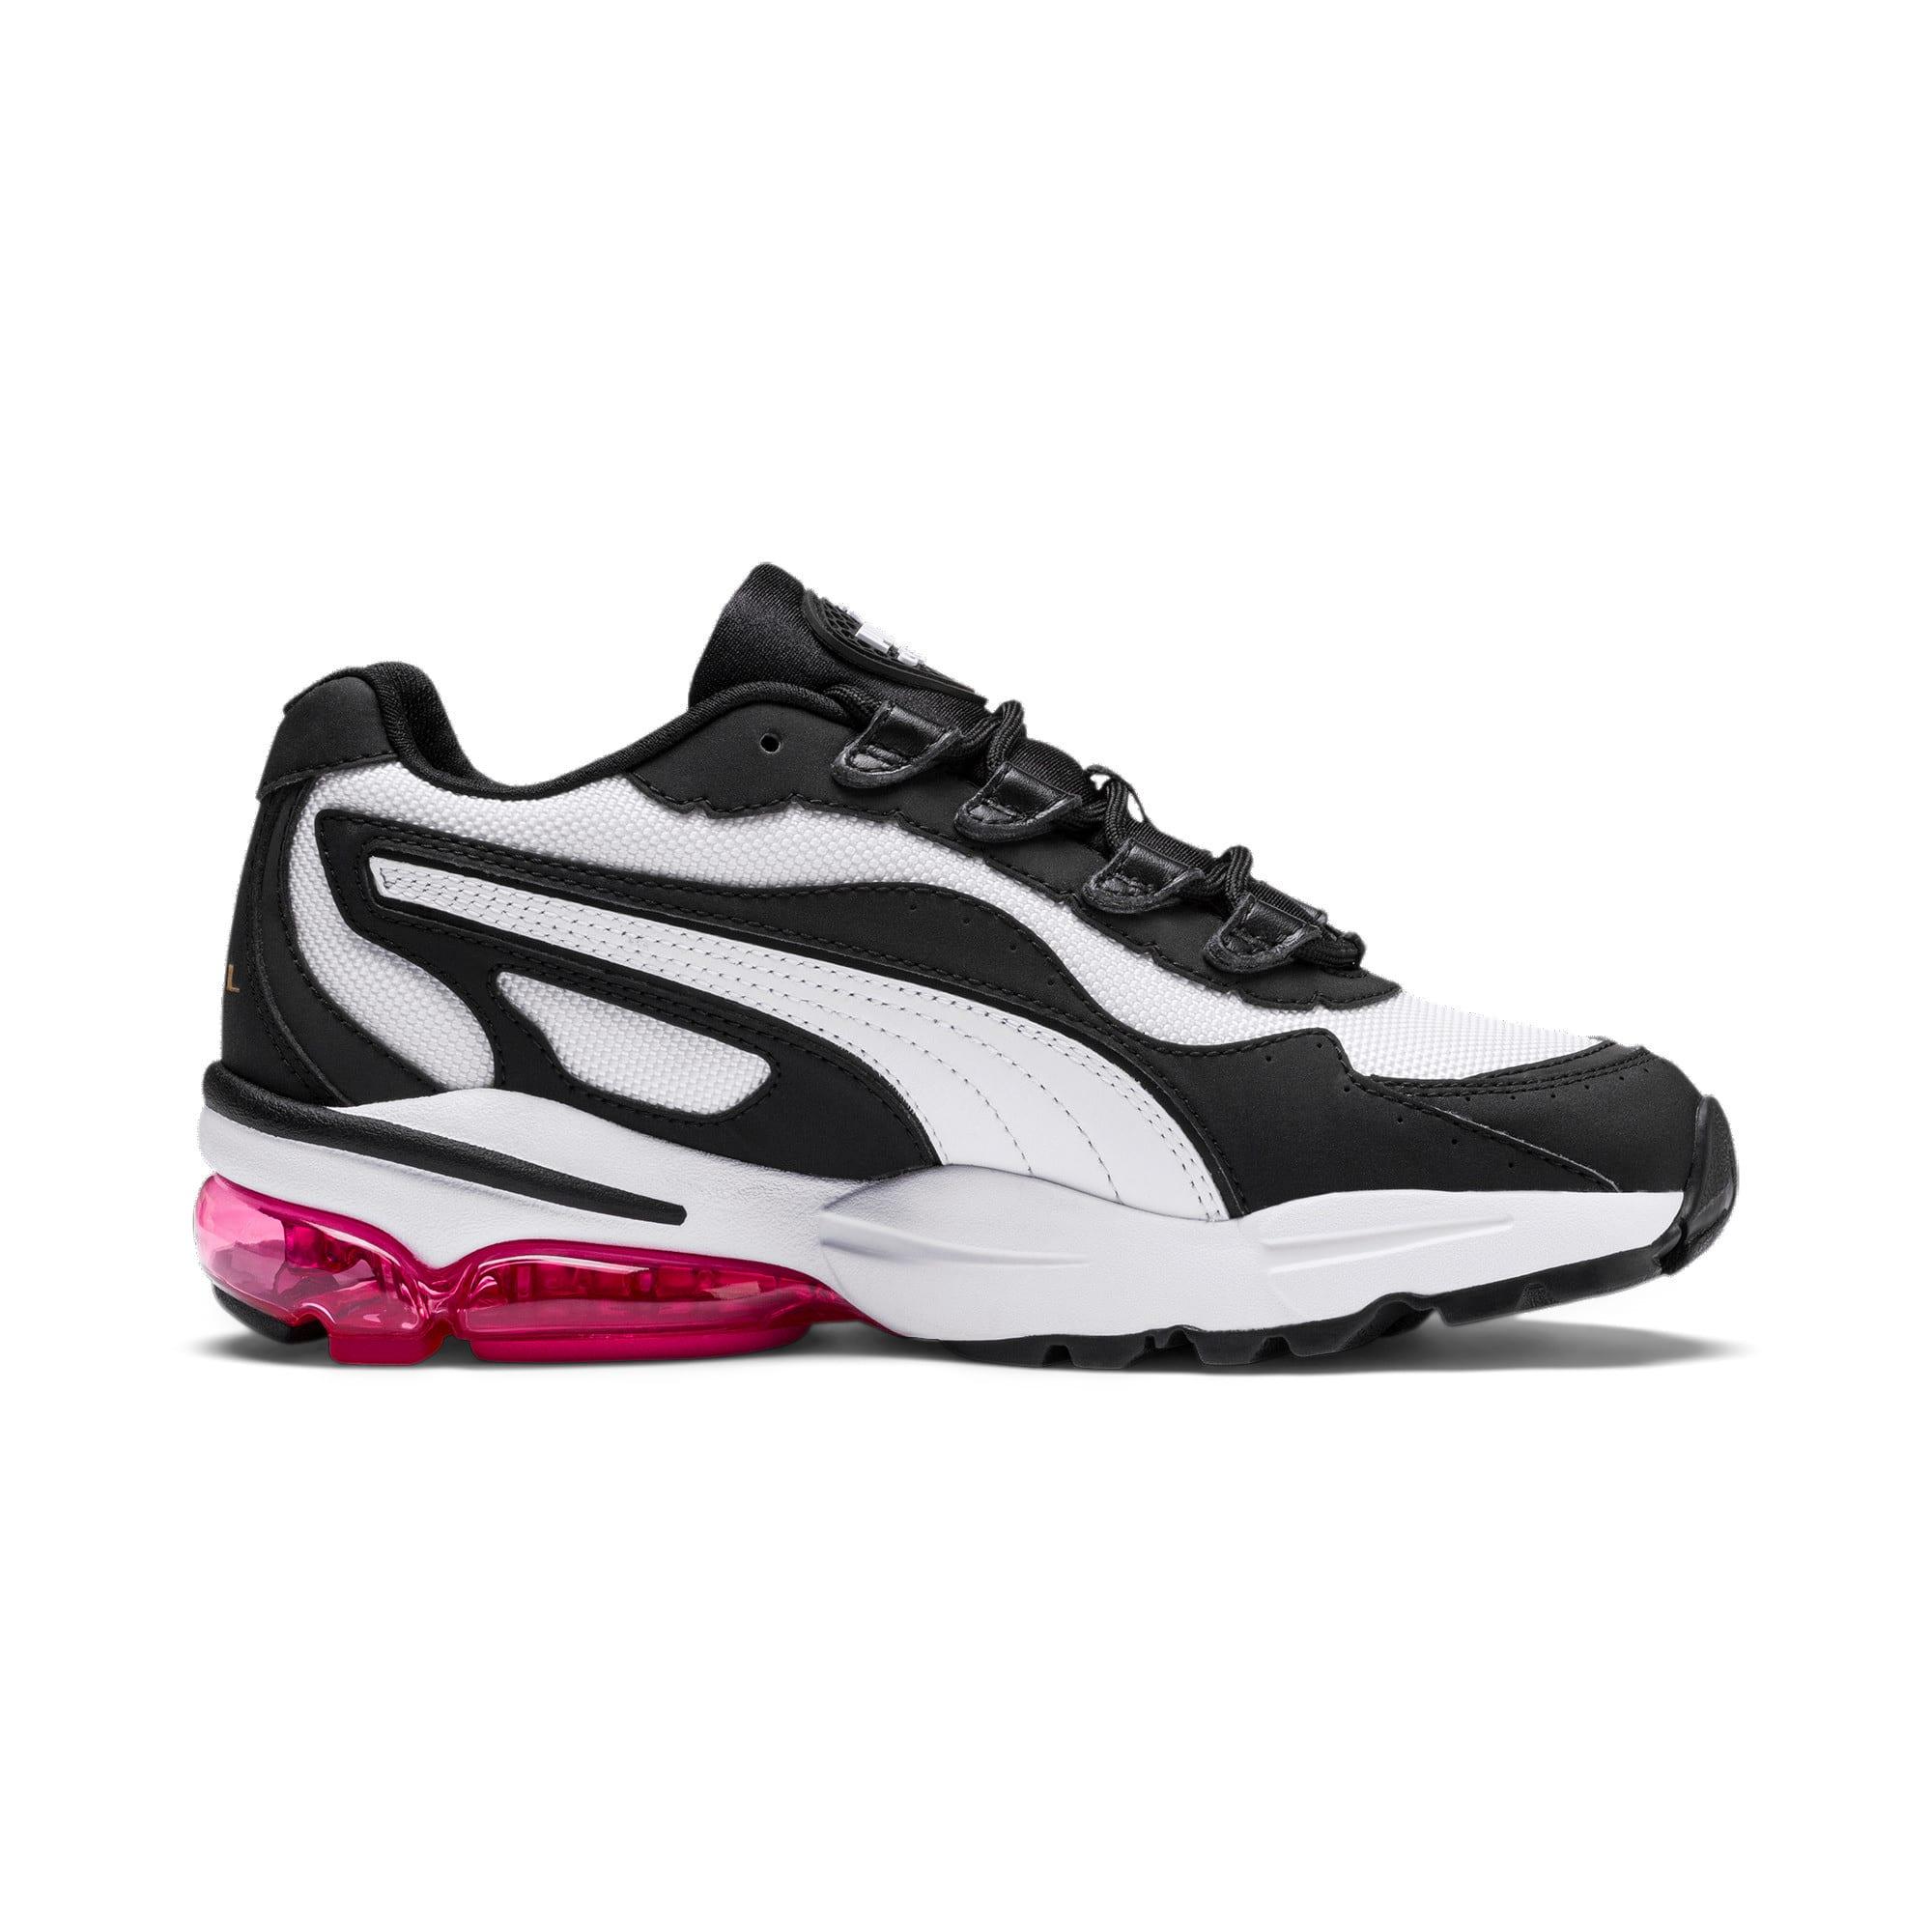 Thumbnail 5 of CELL Stellar Women's Sneakers, Puma White-Puma Black, medium